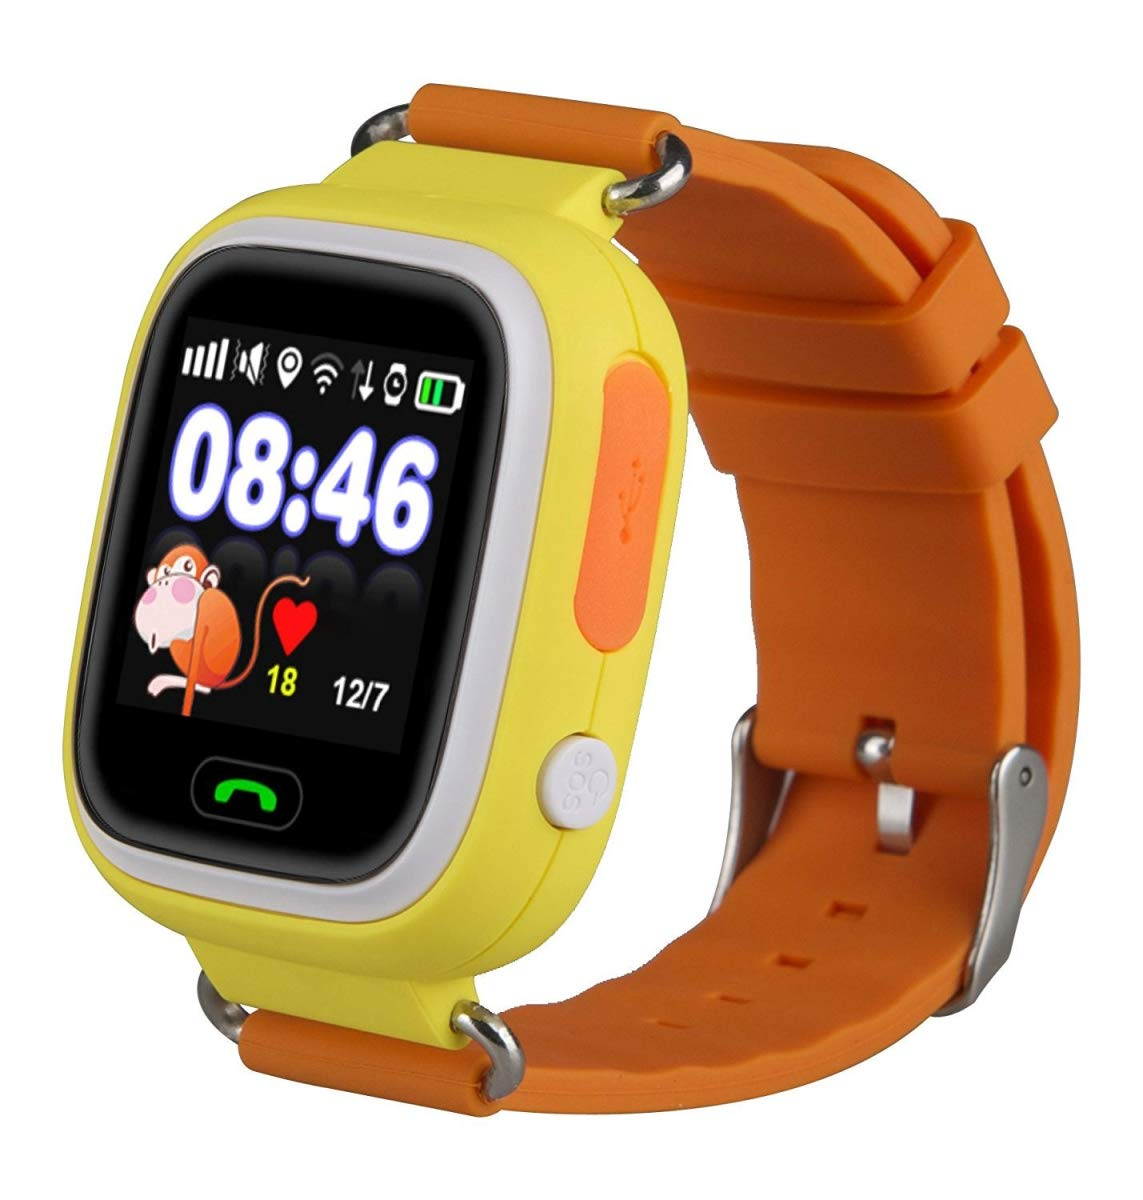 TechComm Q90 Kids GPS Smart Watch Fitness Tracker Call & Text by TechComm (Image #1)